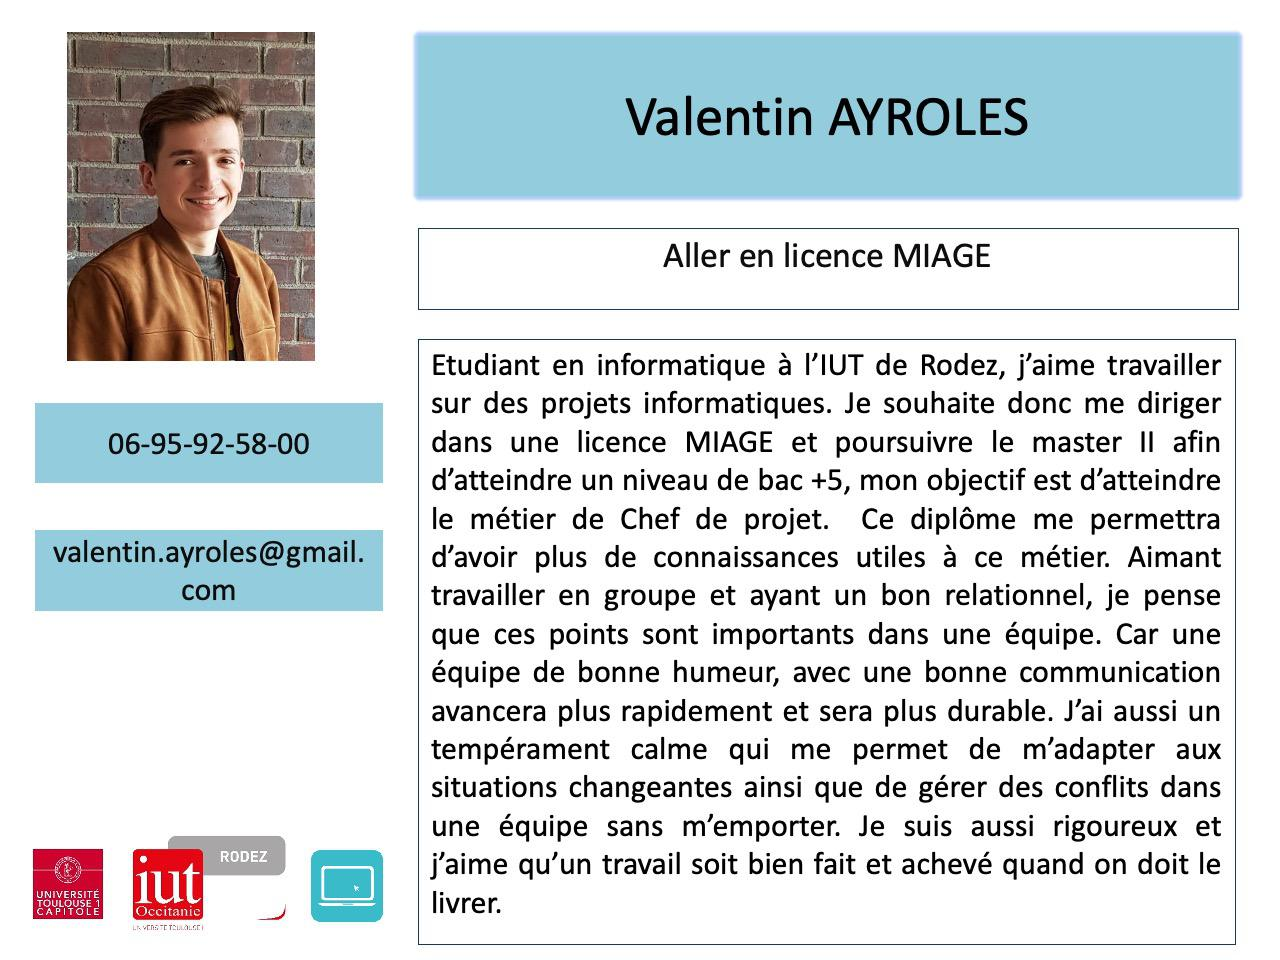 Valentin Ayroles